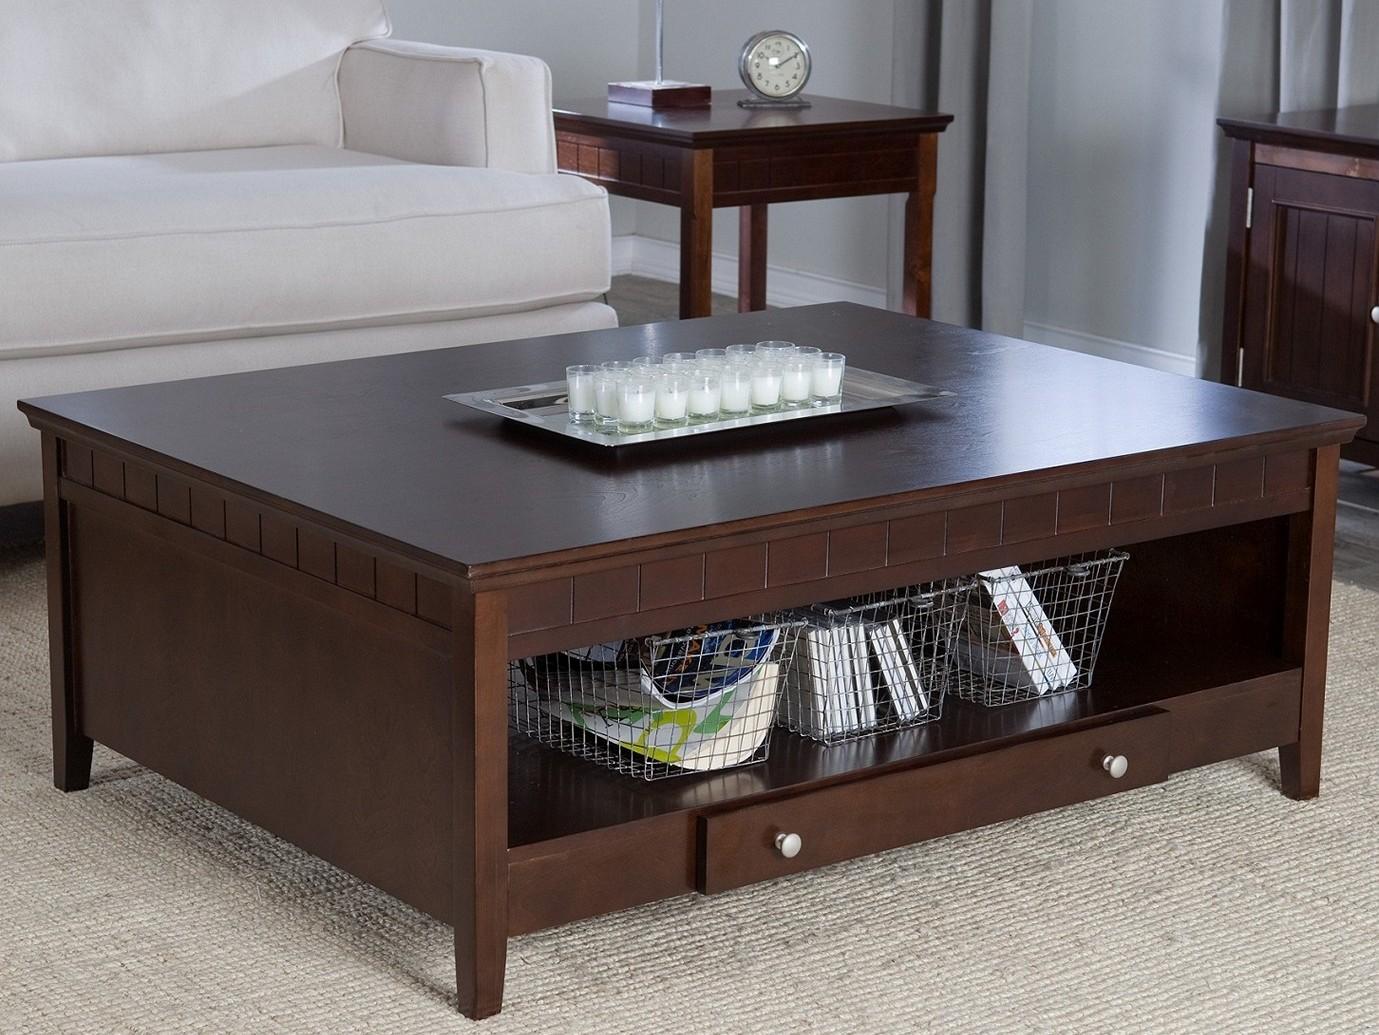 Espresso Coffee Table with Open Shelf